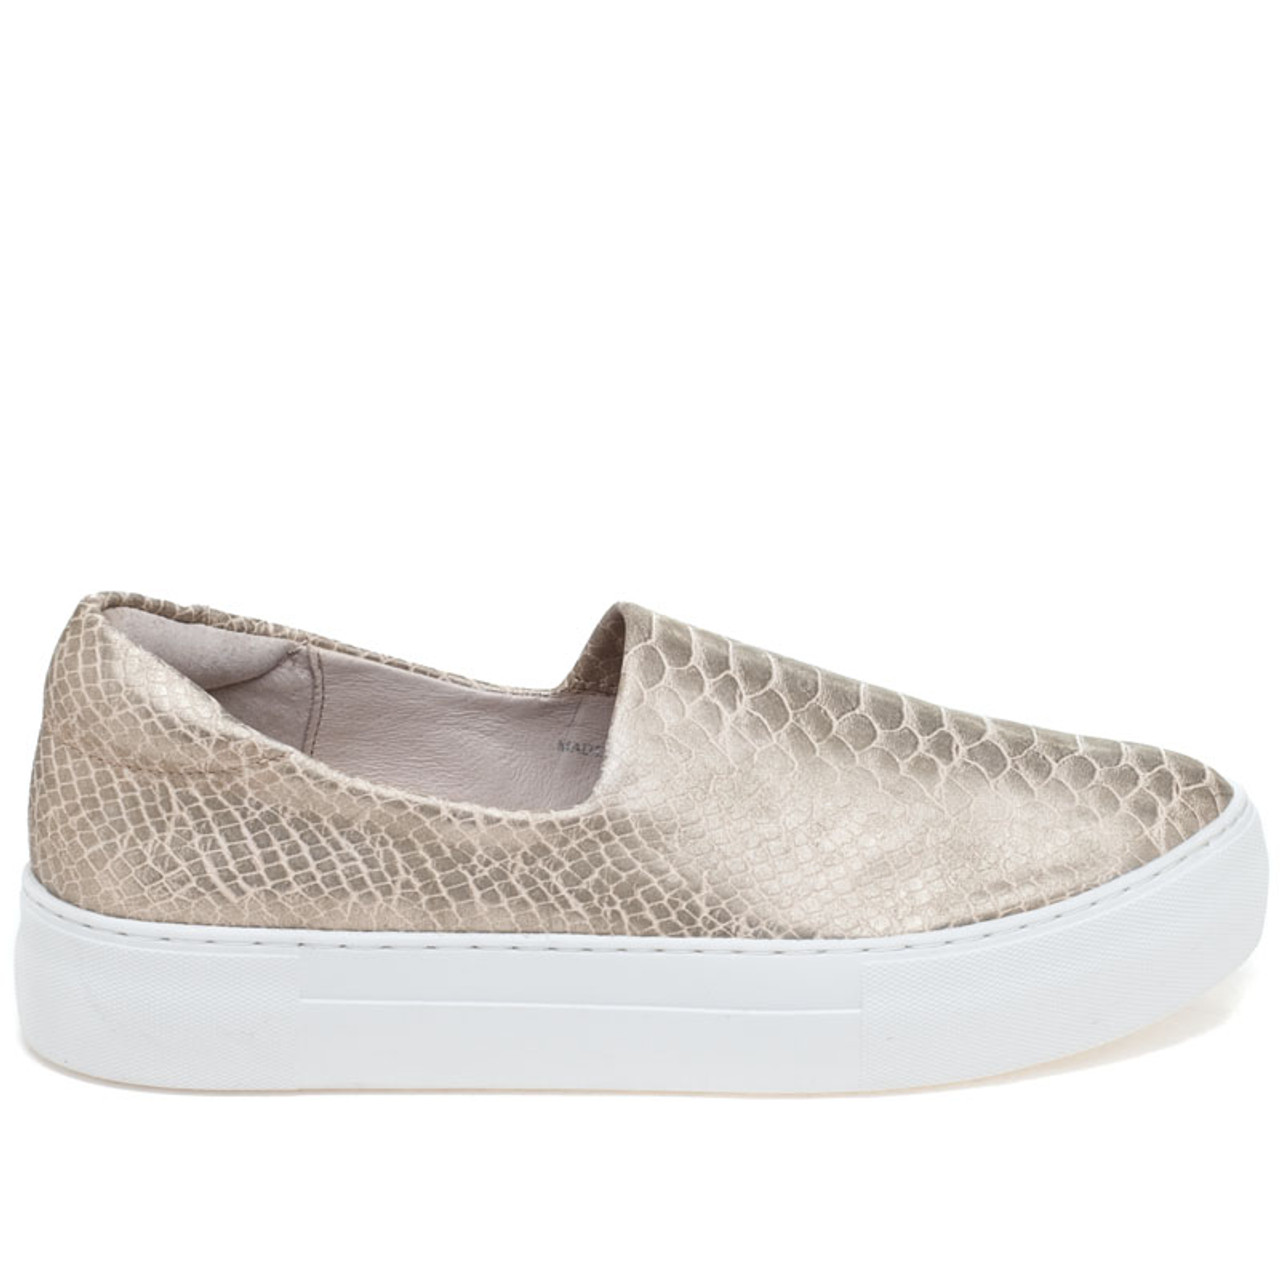 J Slides Ariana Metallic Snake Embossed Sneakers LcPsu3dwkA